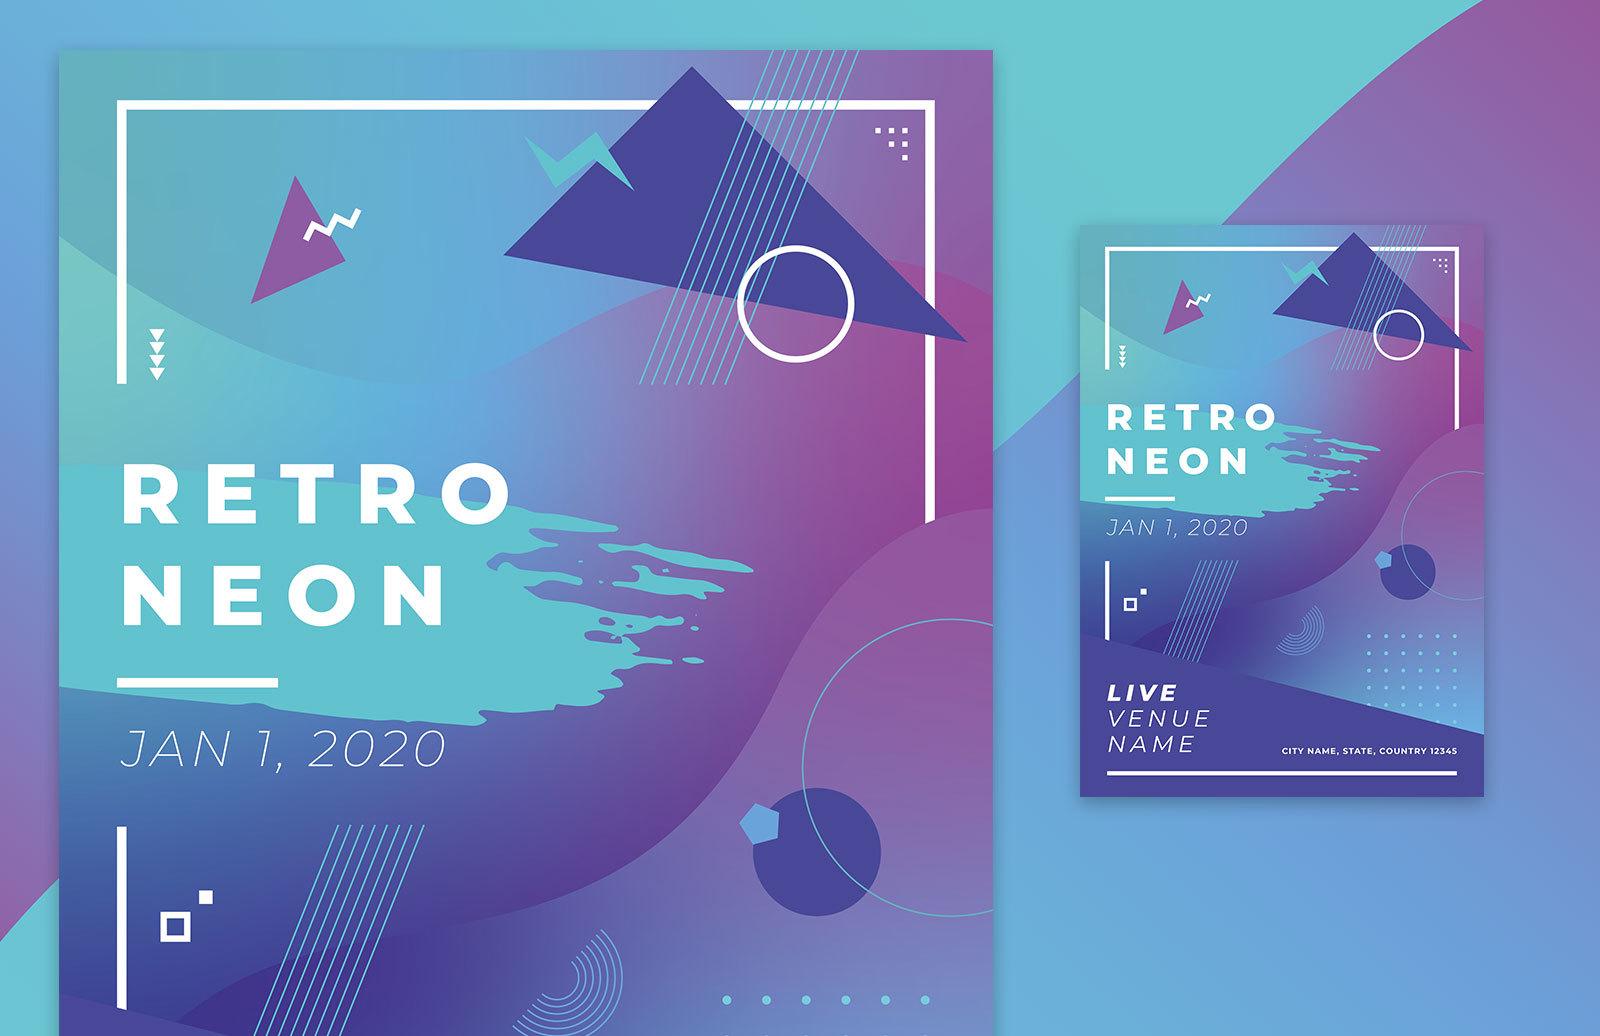 Retro Neon Poster Template Preview 1